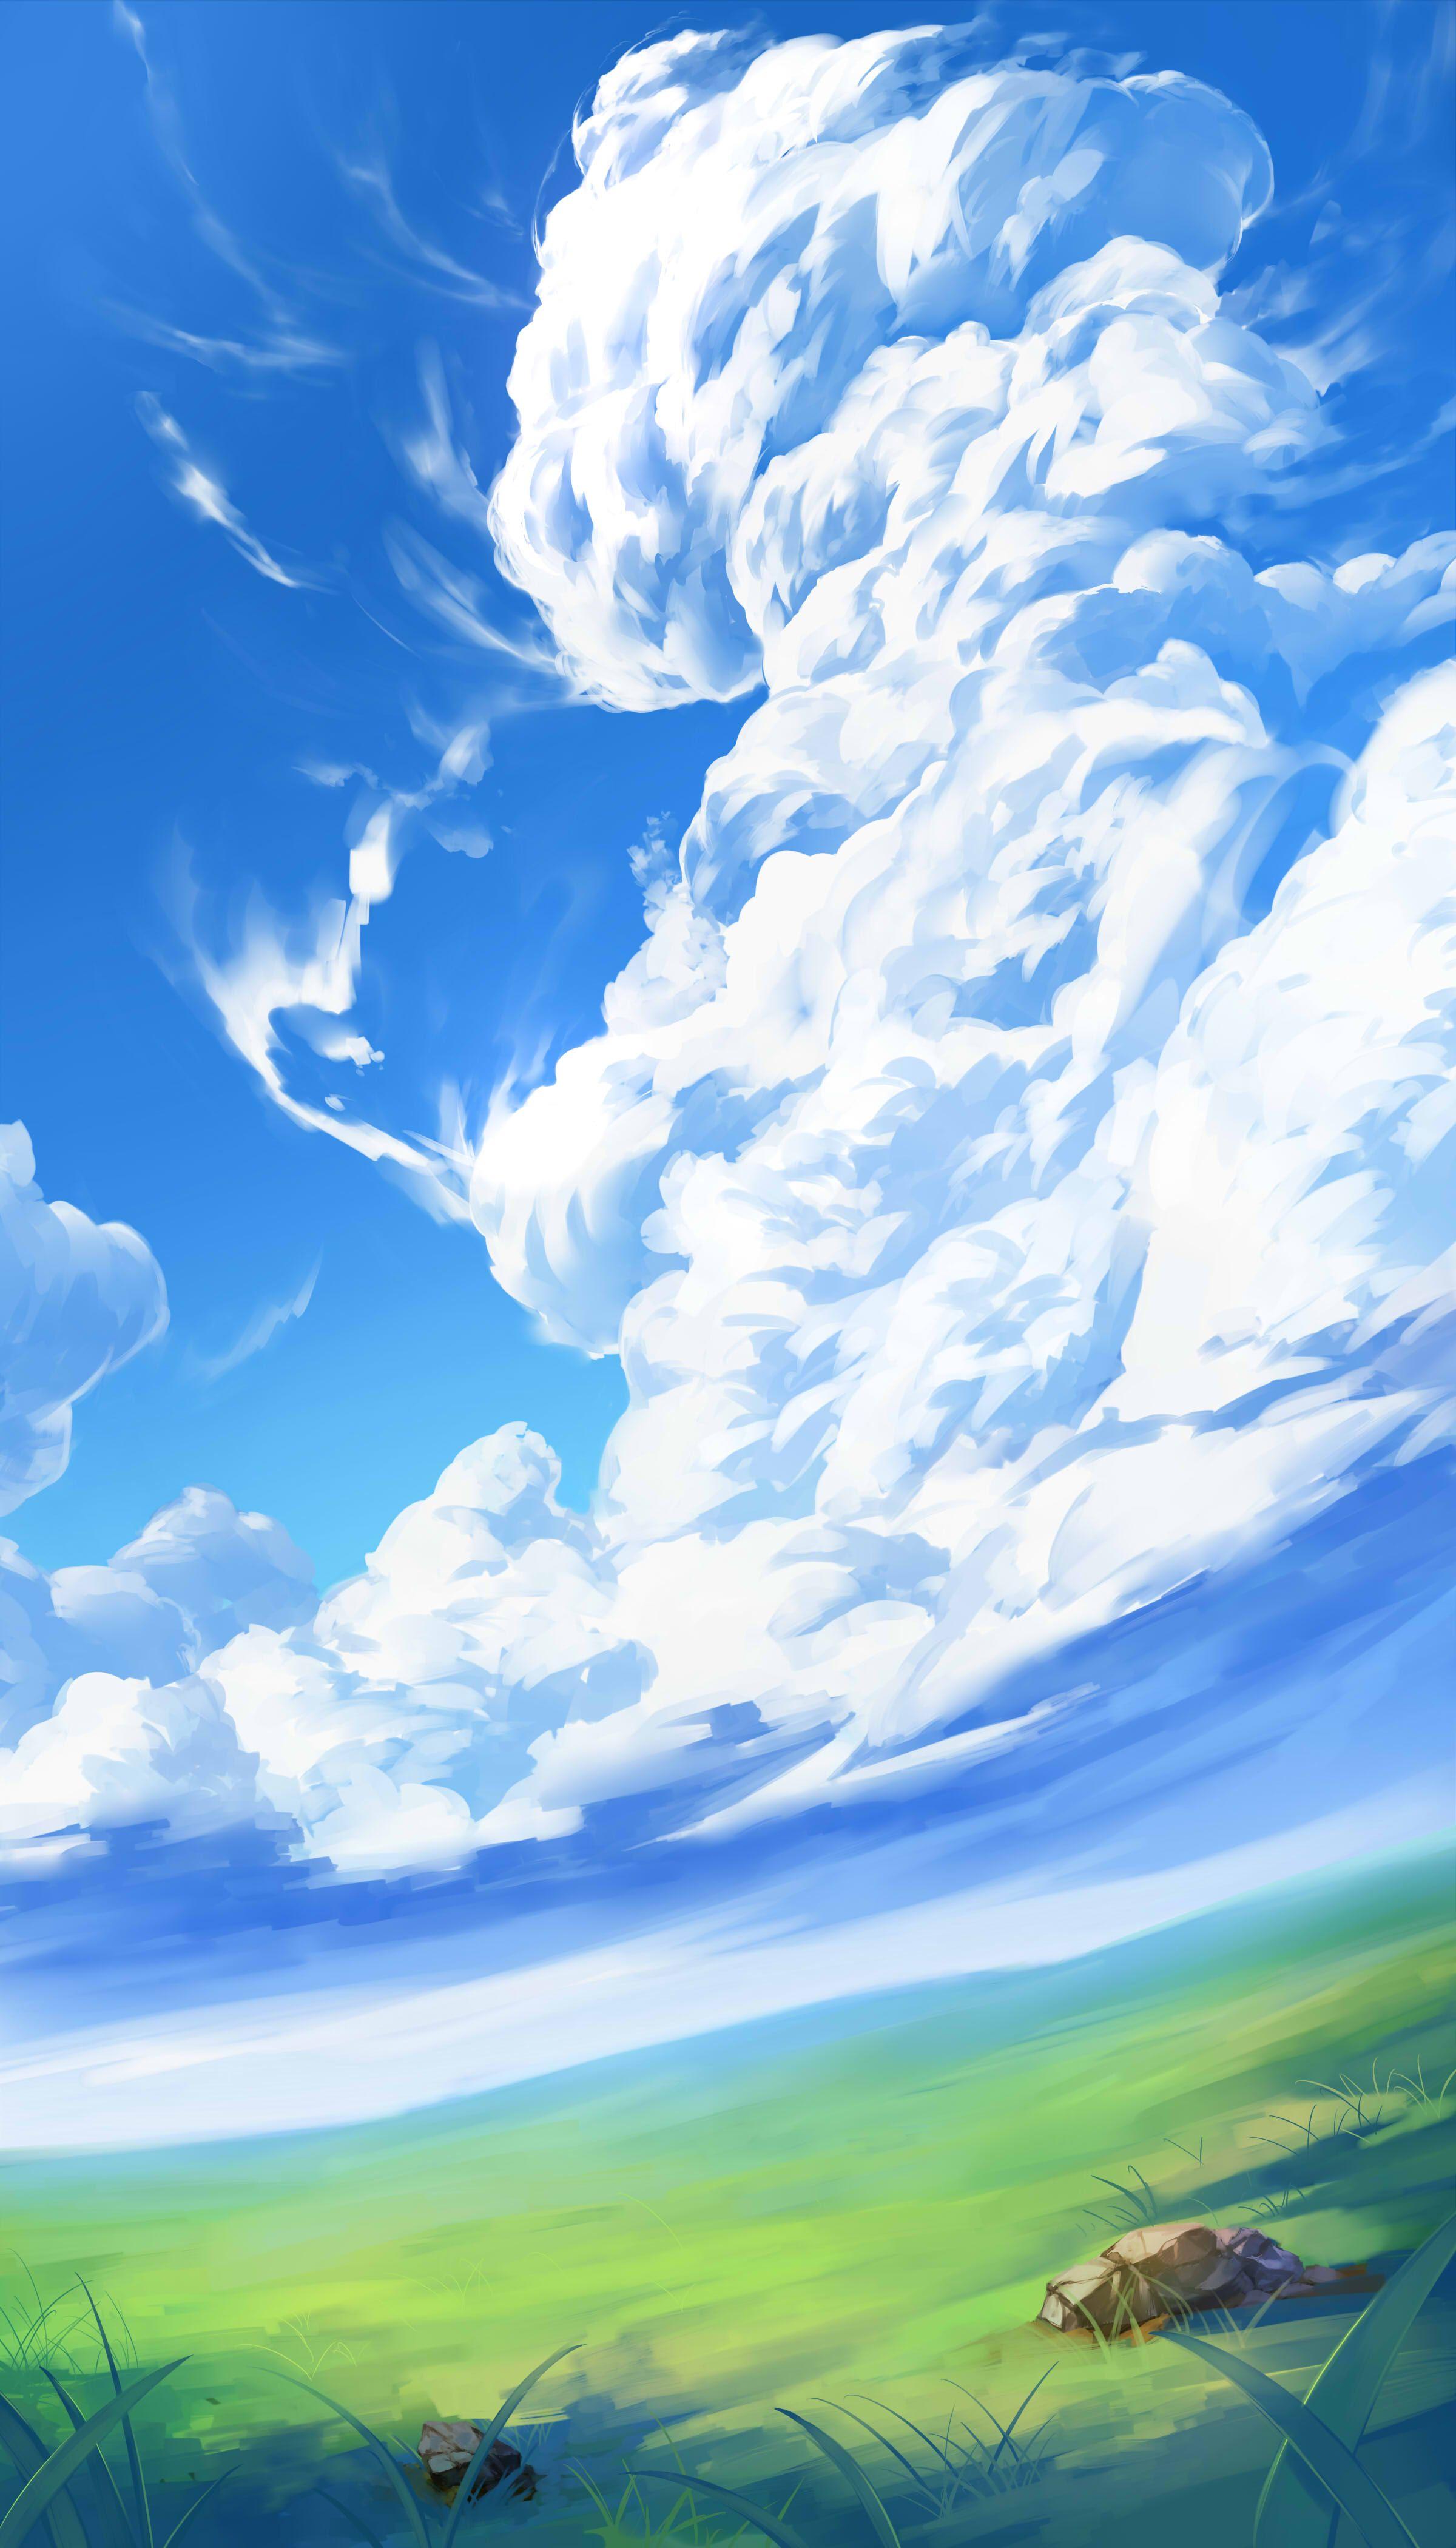 Grassland Anime Wallpapers - Wallpaper Cave